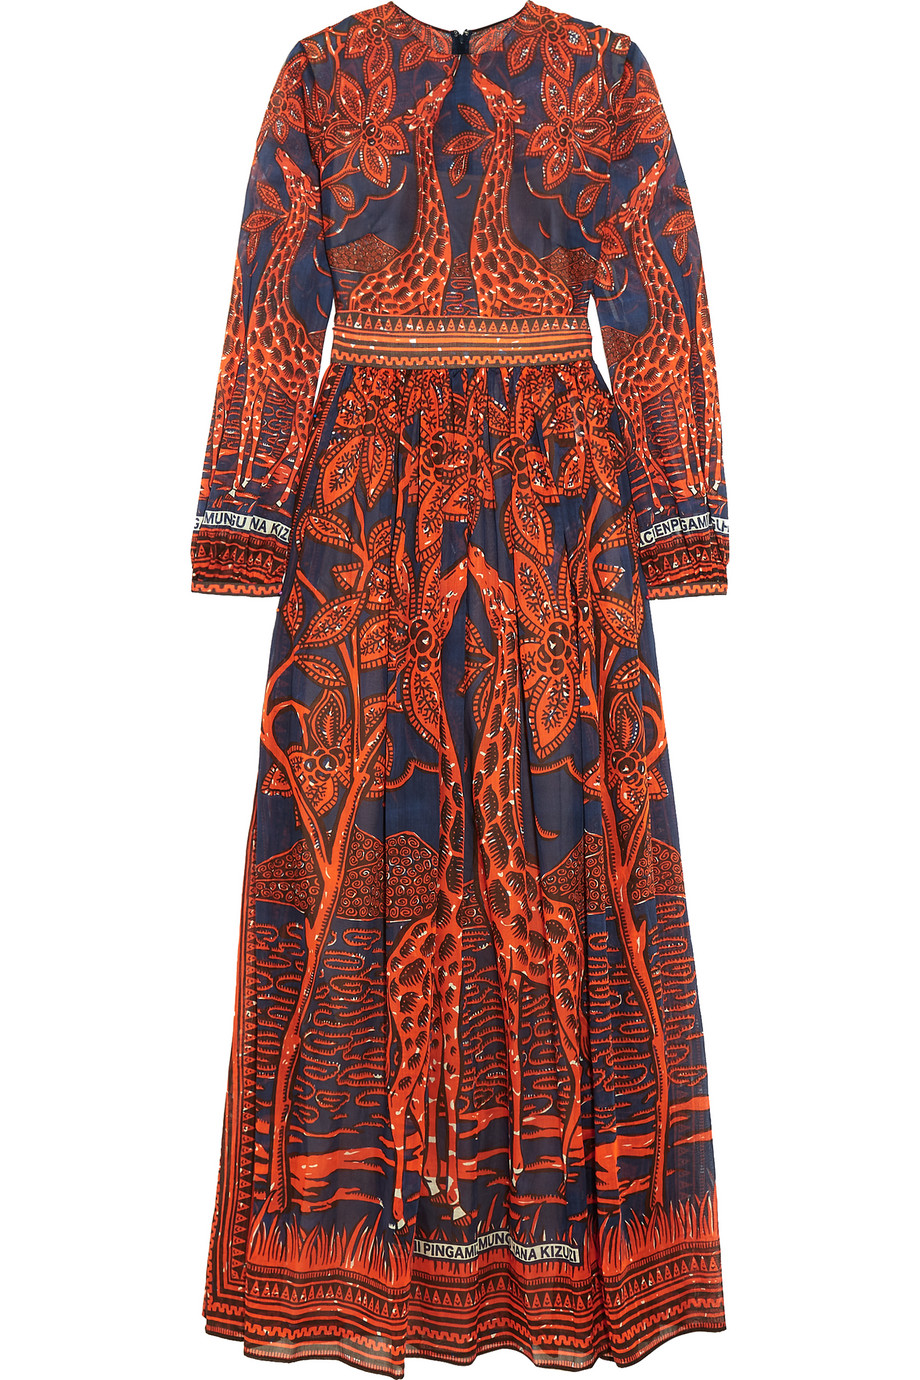 Valentino Printed Cotton Gown, Orange, Women's - Printed, Size: 44